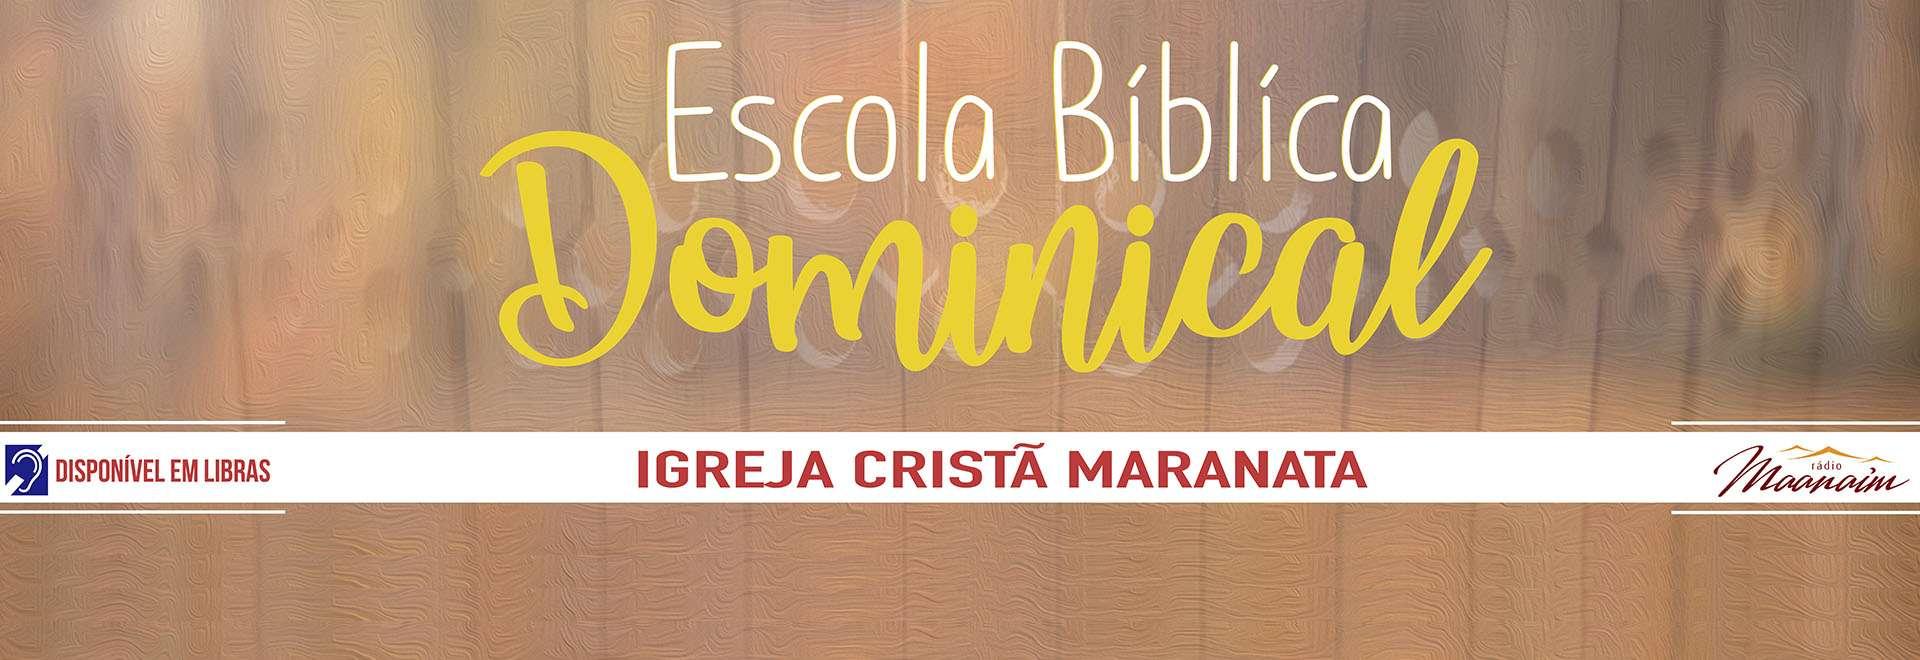 Participações da EBD da Igreja Cristã Maranata - 07/02/2021